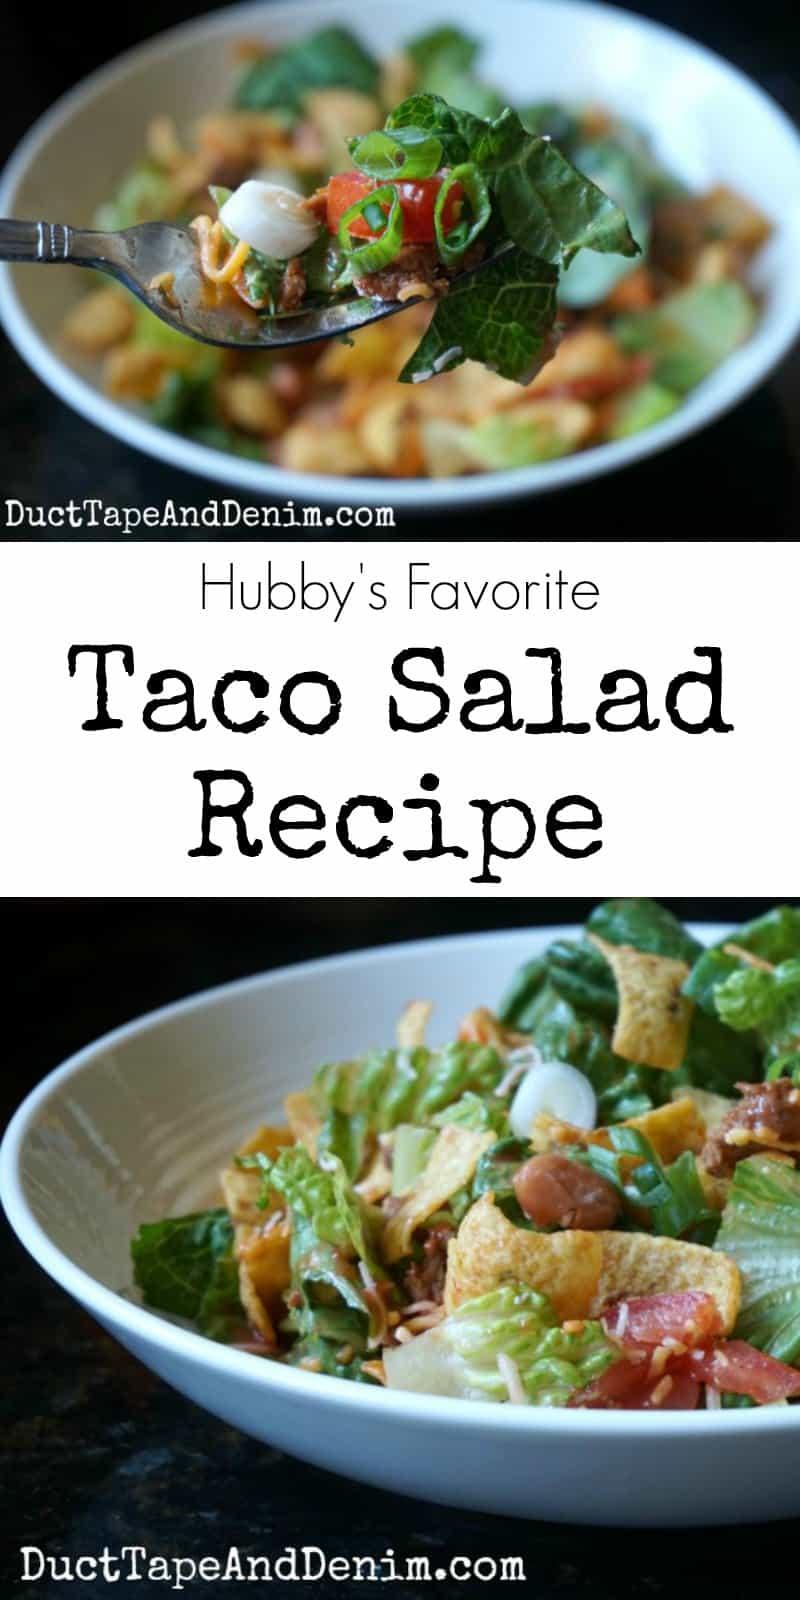 Hubby's favorite taco salad recipe. A filling main dish salad for summer. | DuctTapeAndDenim.com